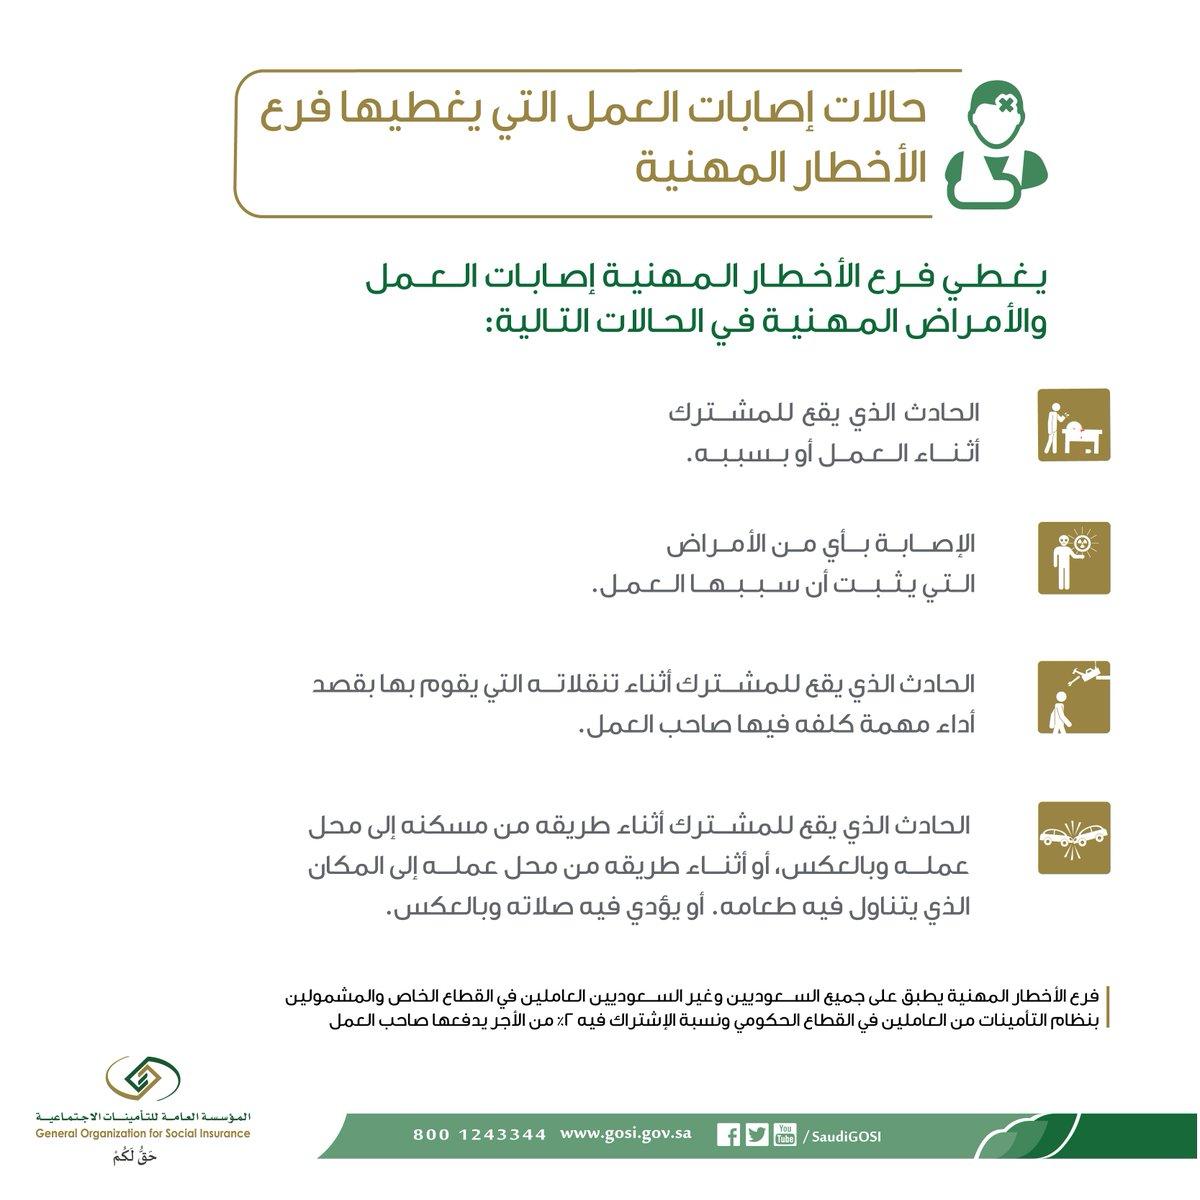 c9fe23c75 التأمينات الاجتماعية (@SaudiGOSI) | Twitter